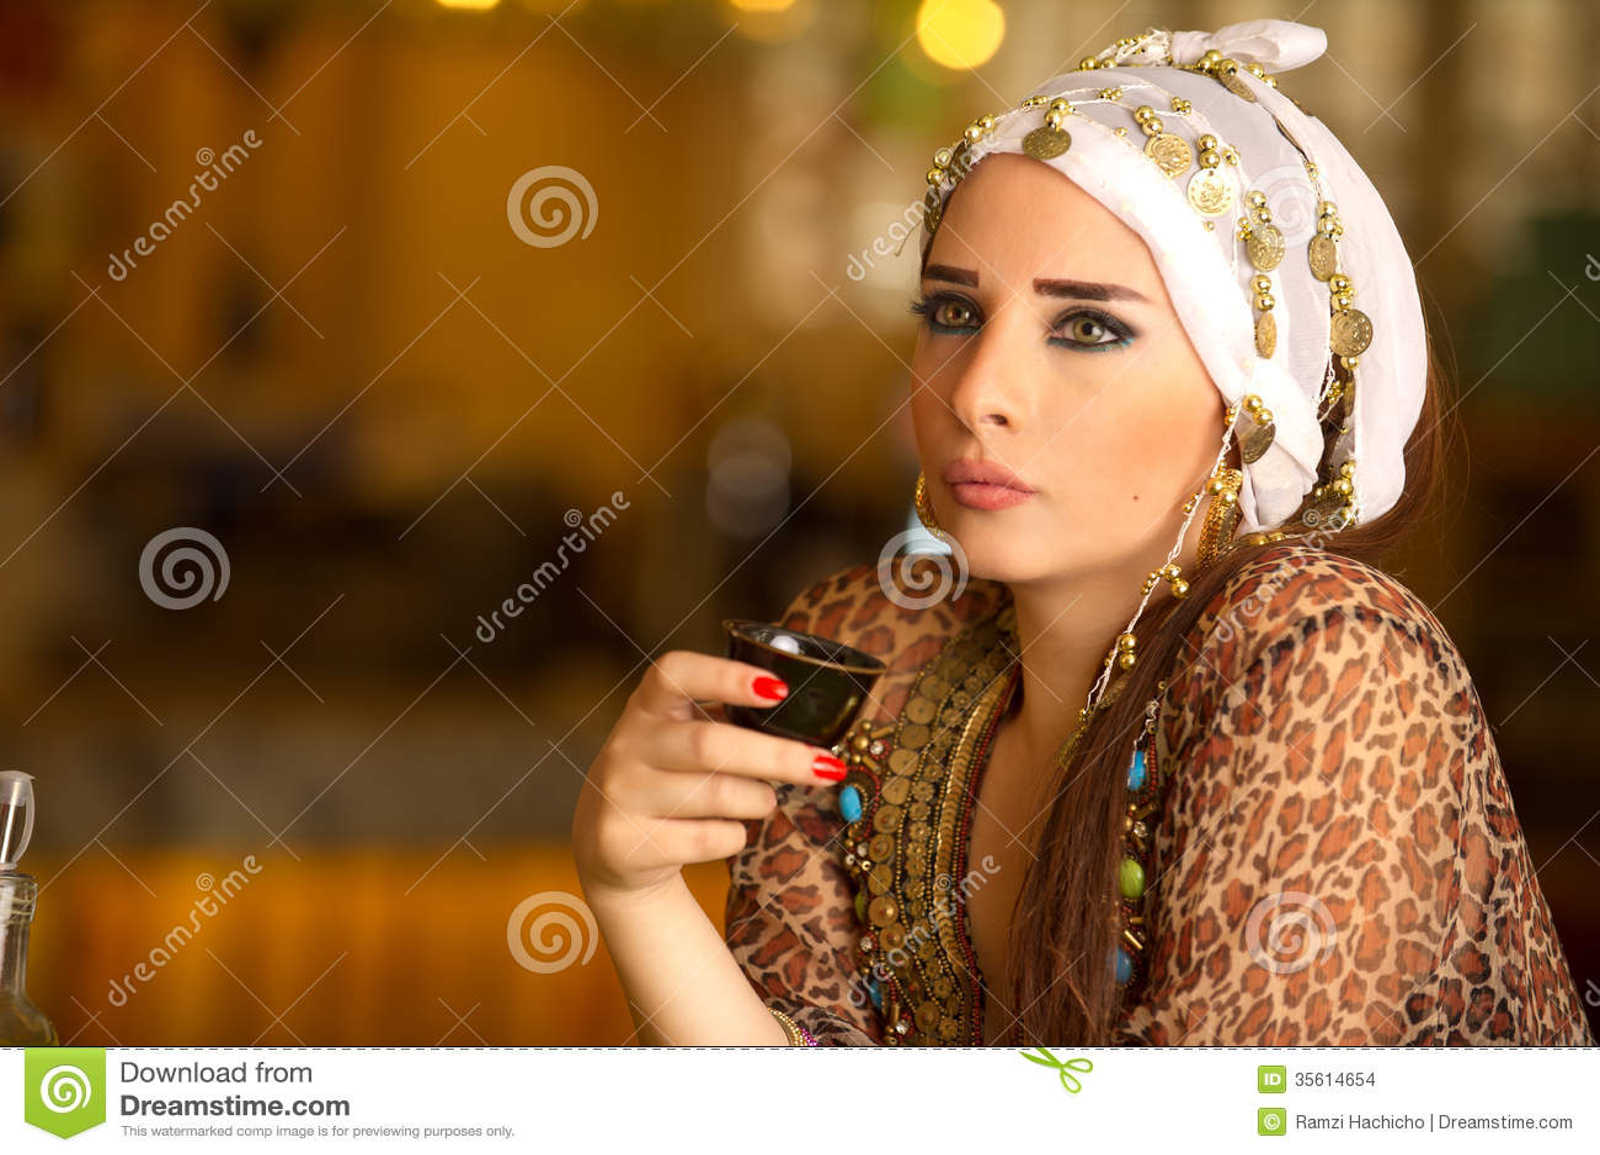 Photos of beautiful transgender women-7651